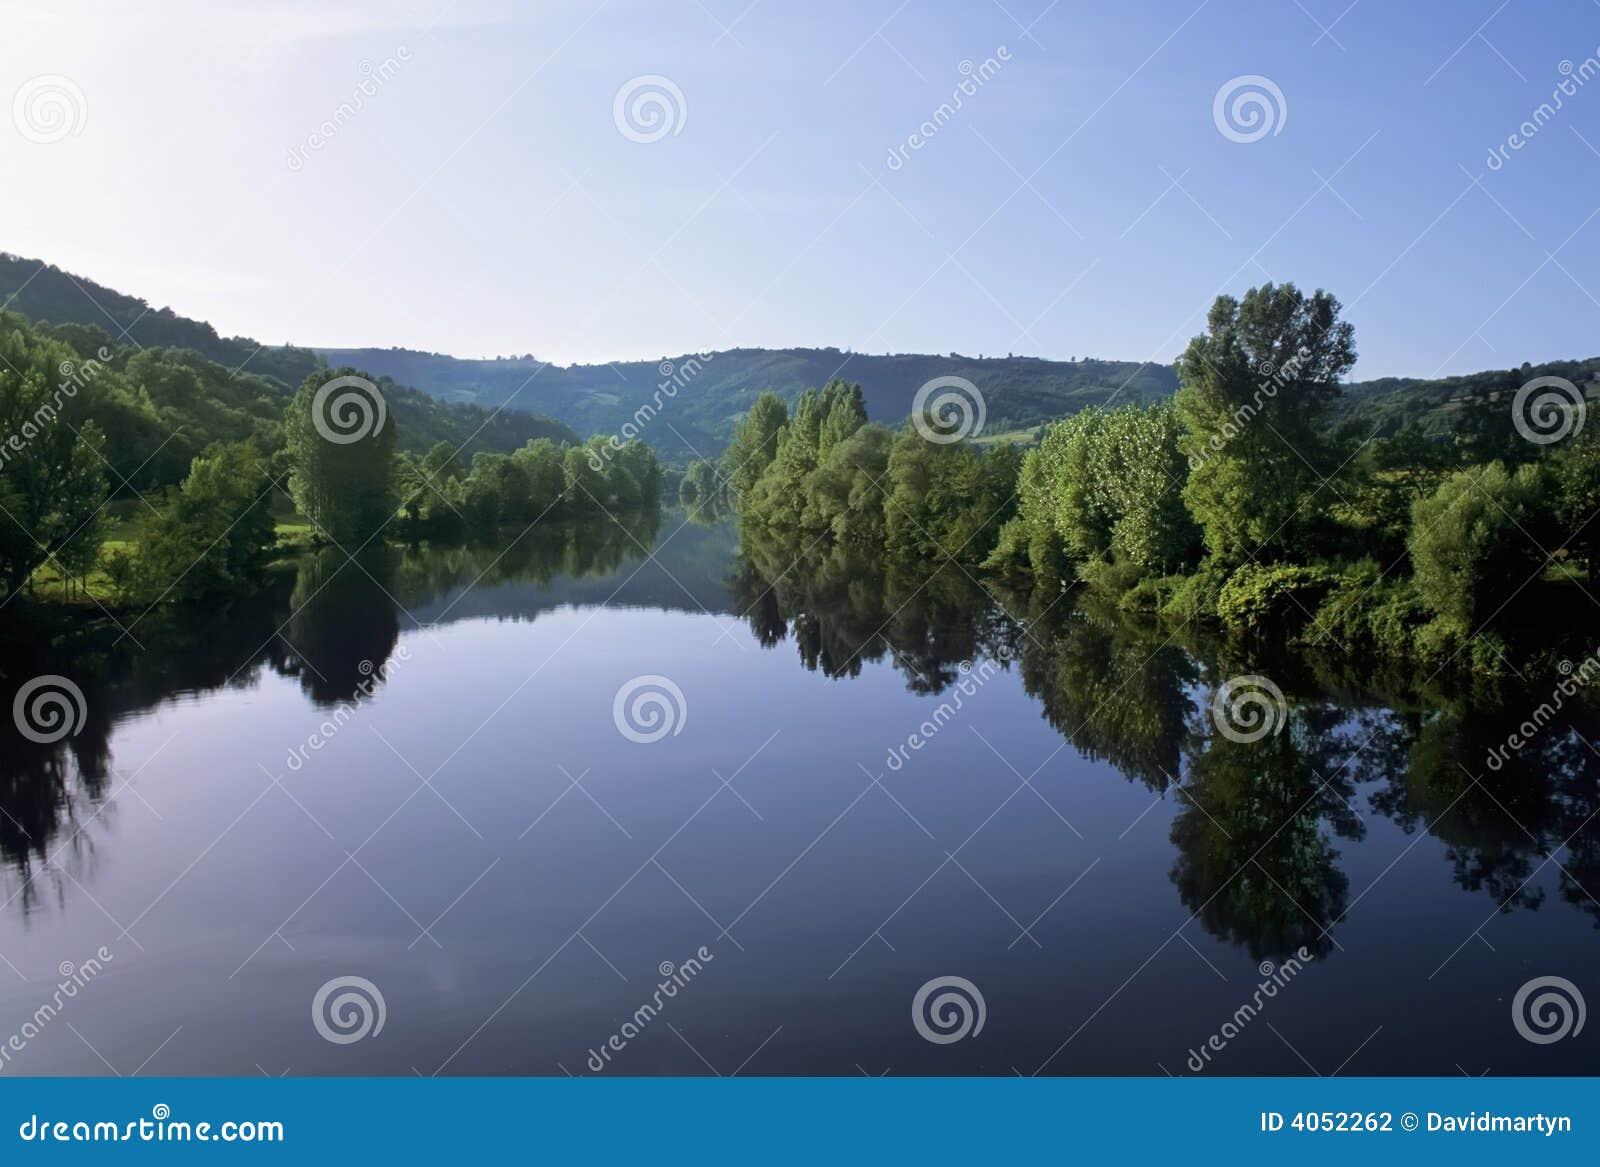 Lote do rio de France midi pyrenees